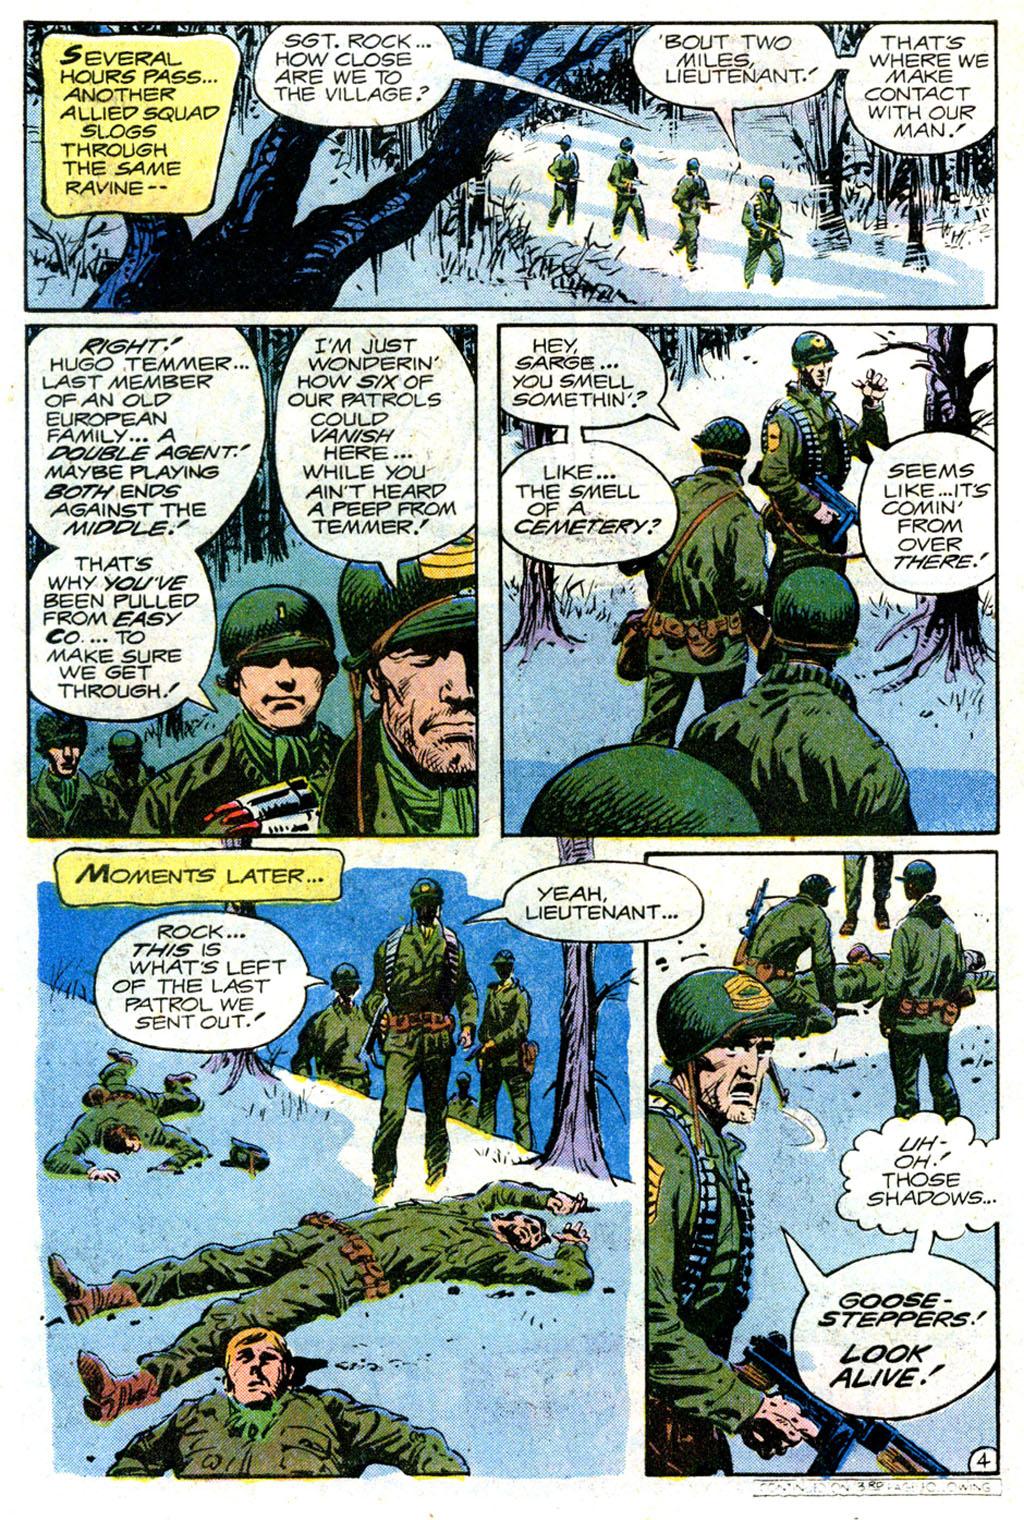 Read online Sgt. Rock comic -  Issue #354 - 4